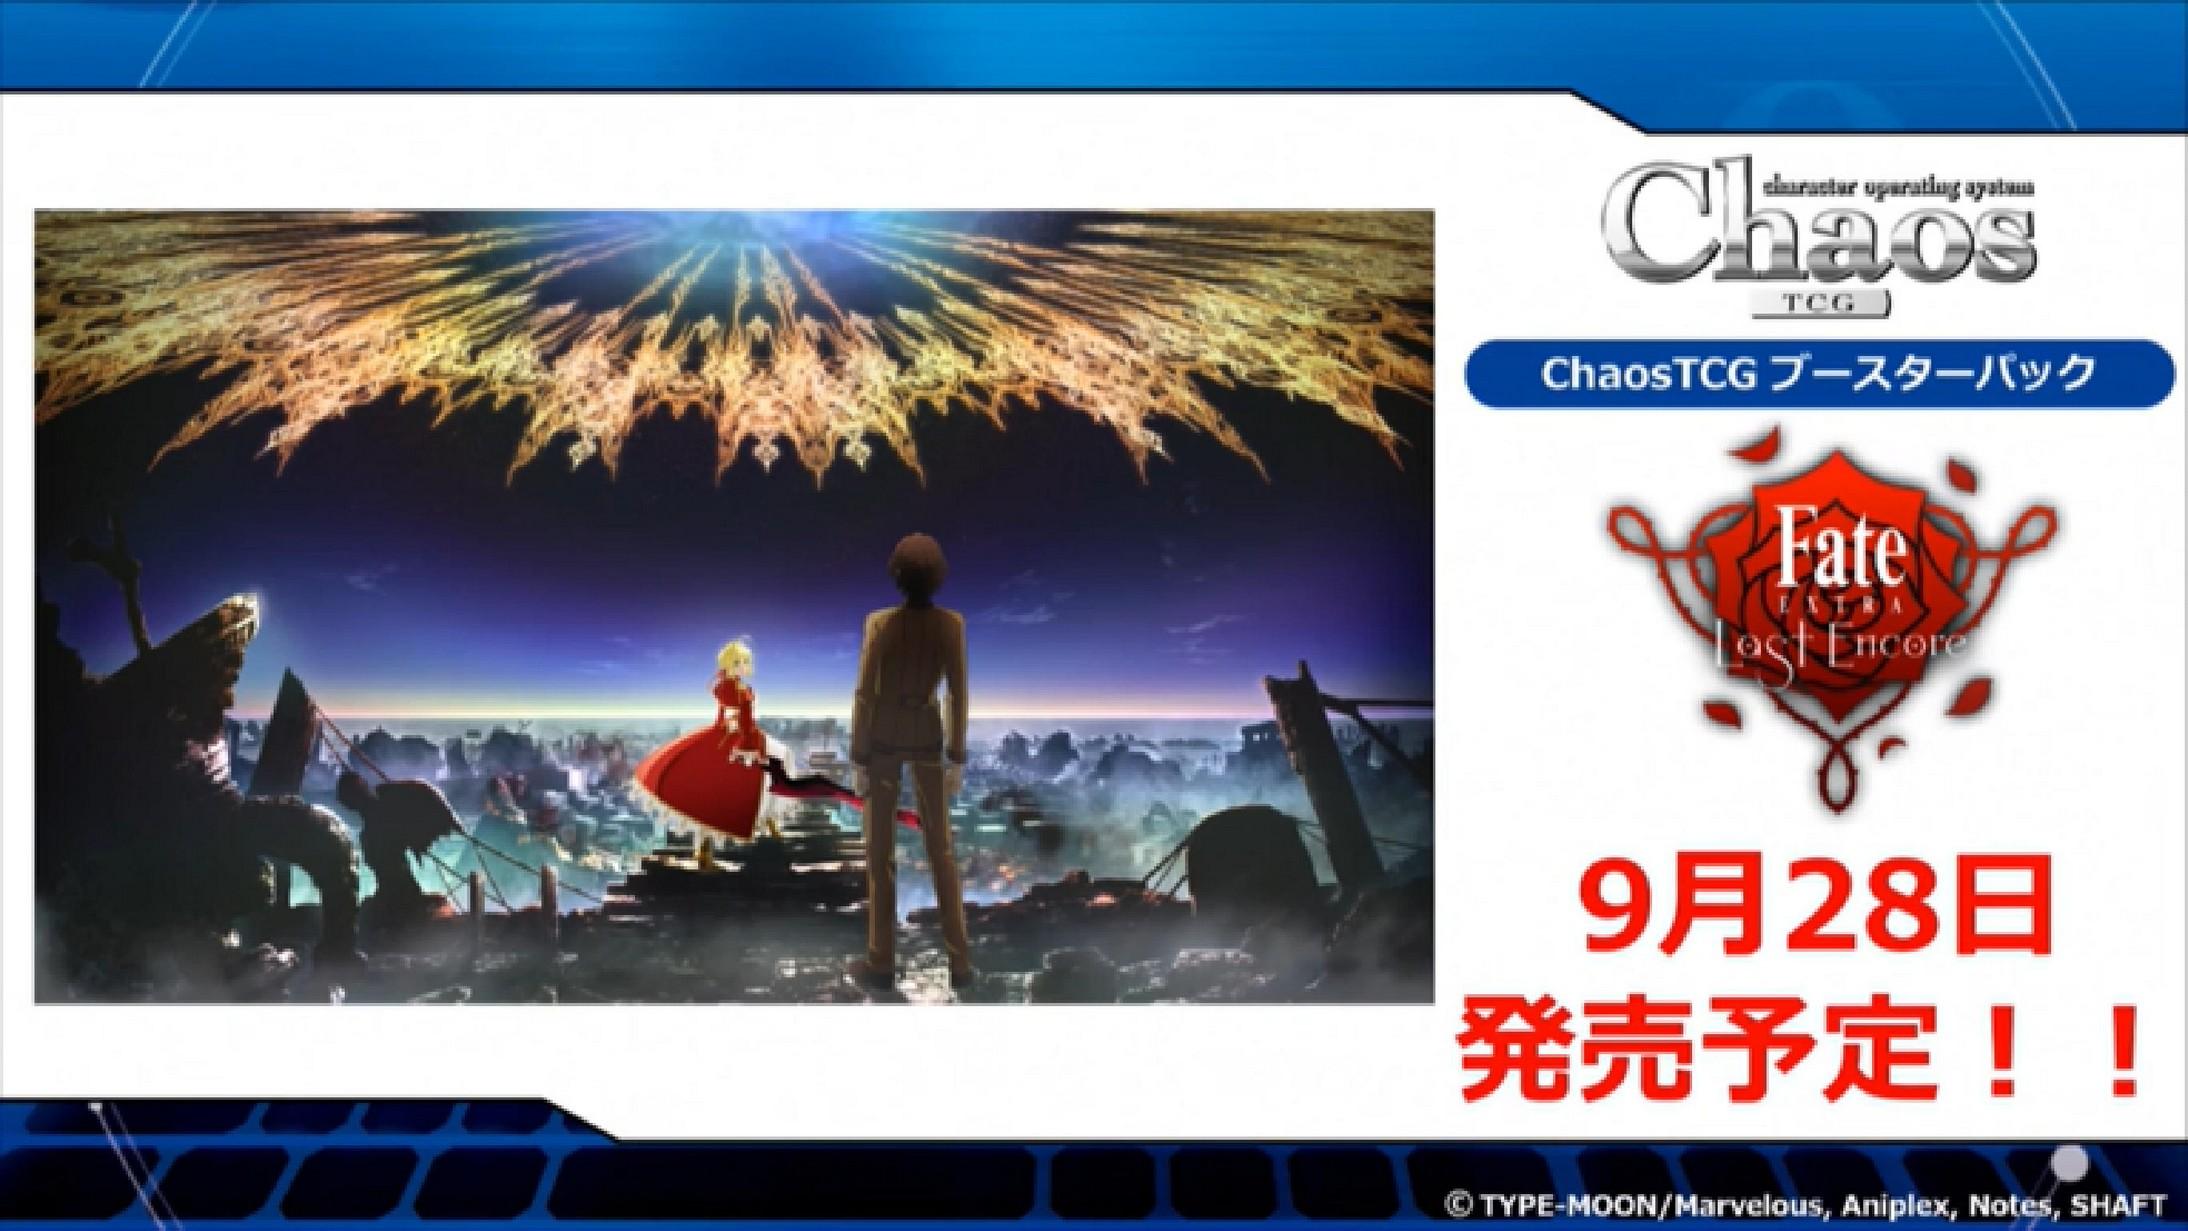 chaos-20180712-046.jpg